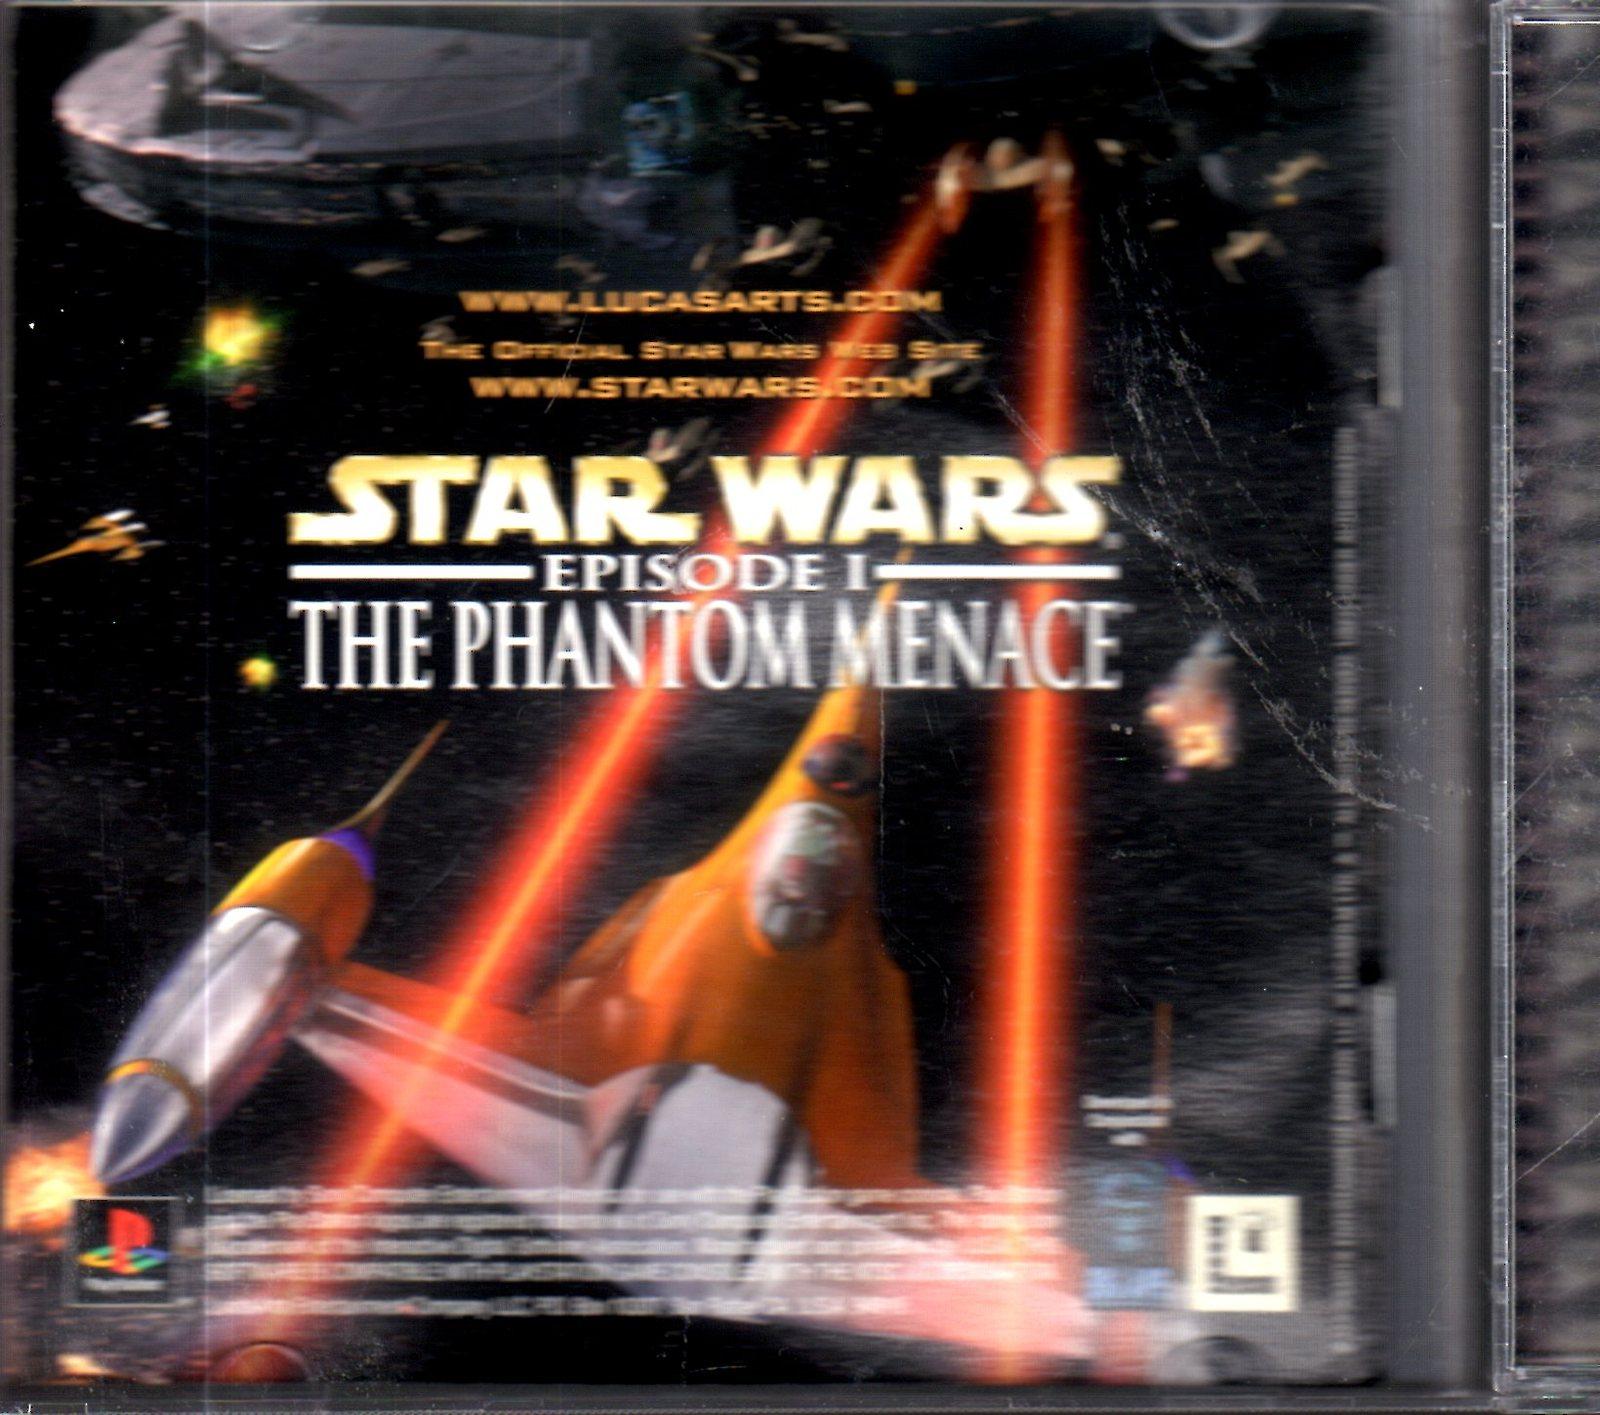 Playstation - Star Wars - Episode I The Phantom Menace